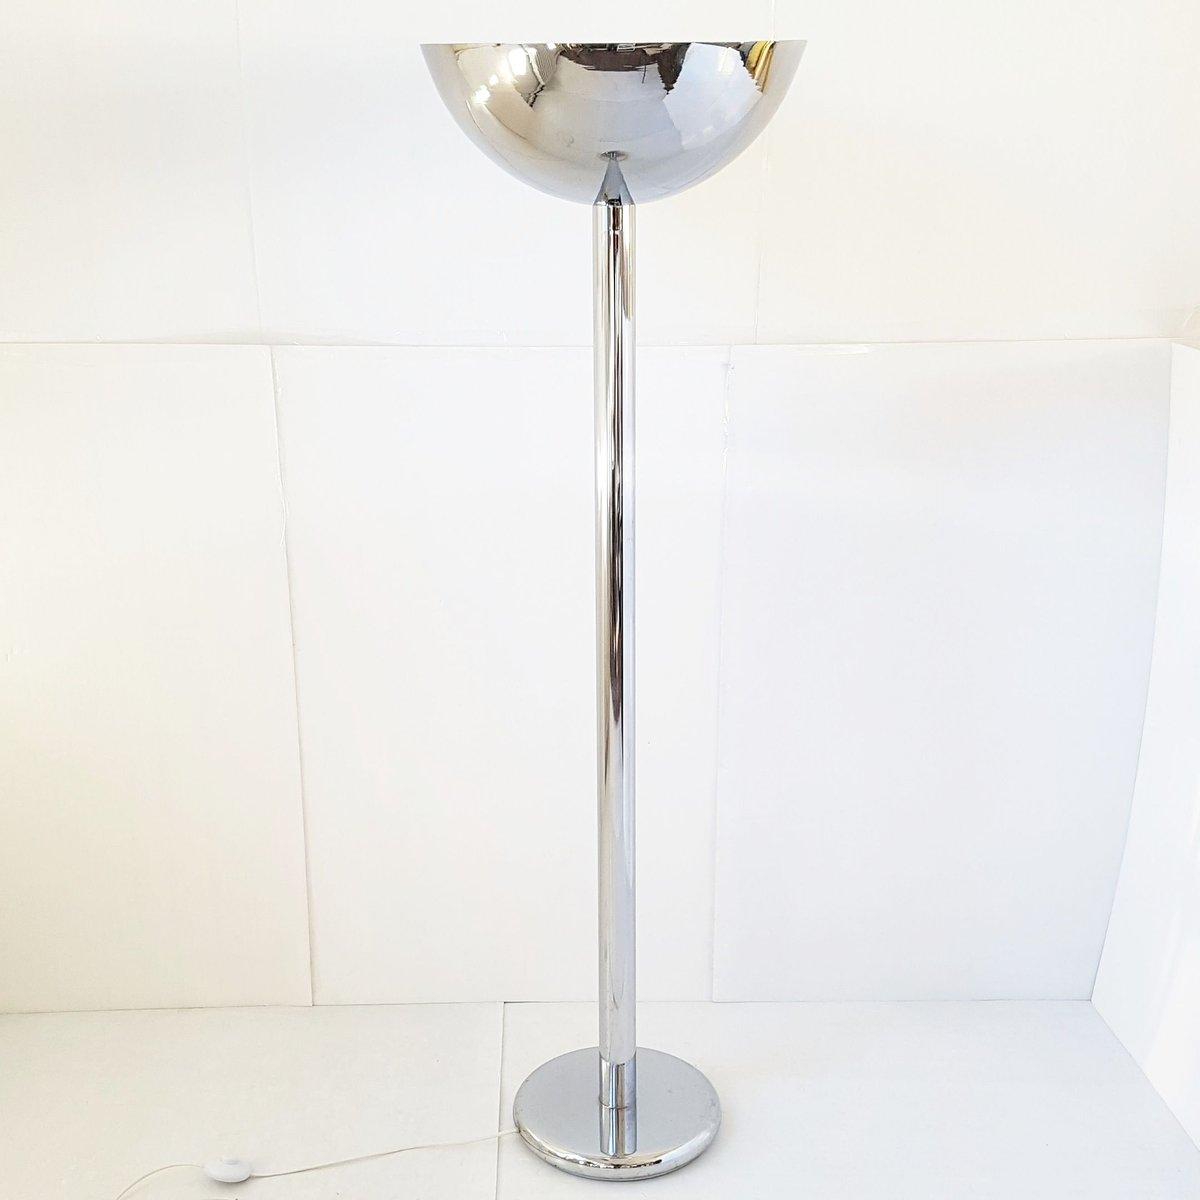 Vintage Chrome Plated Floor Lamp, 1970s